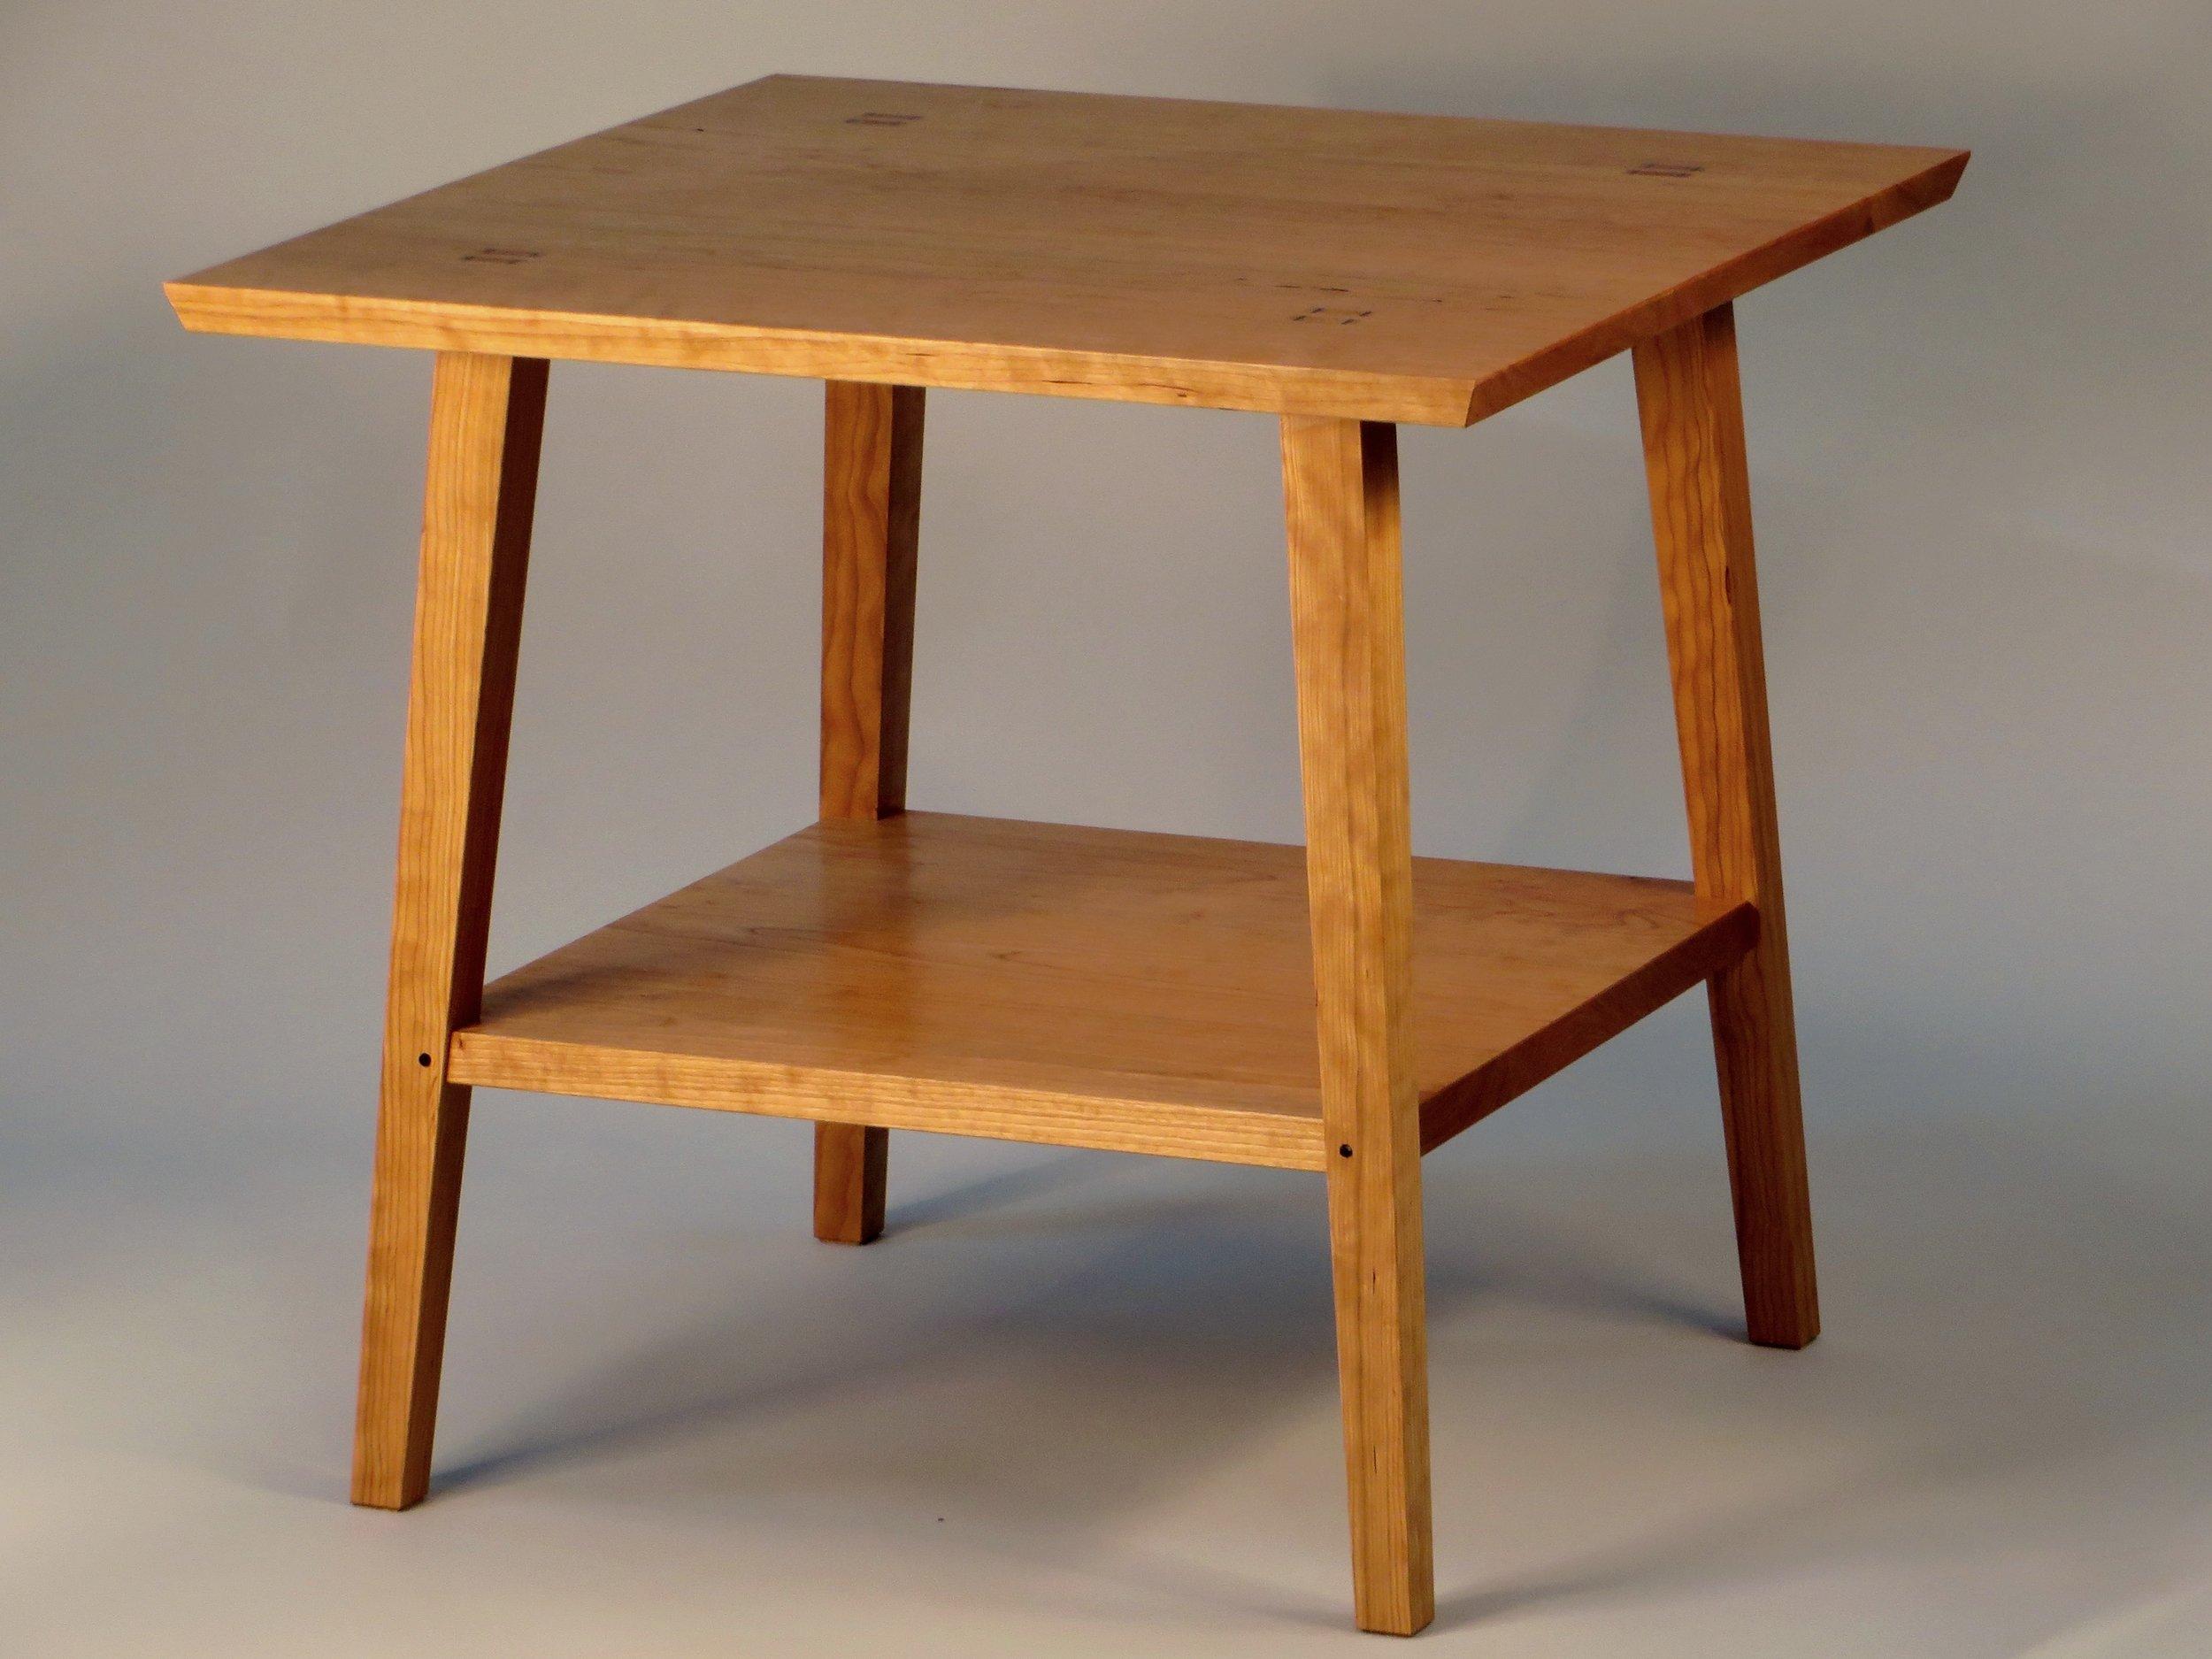 Closeup of a single table